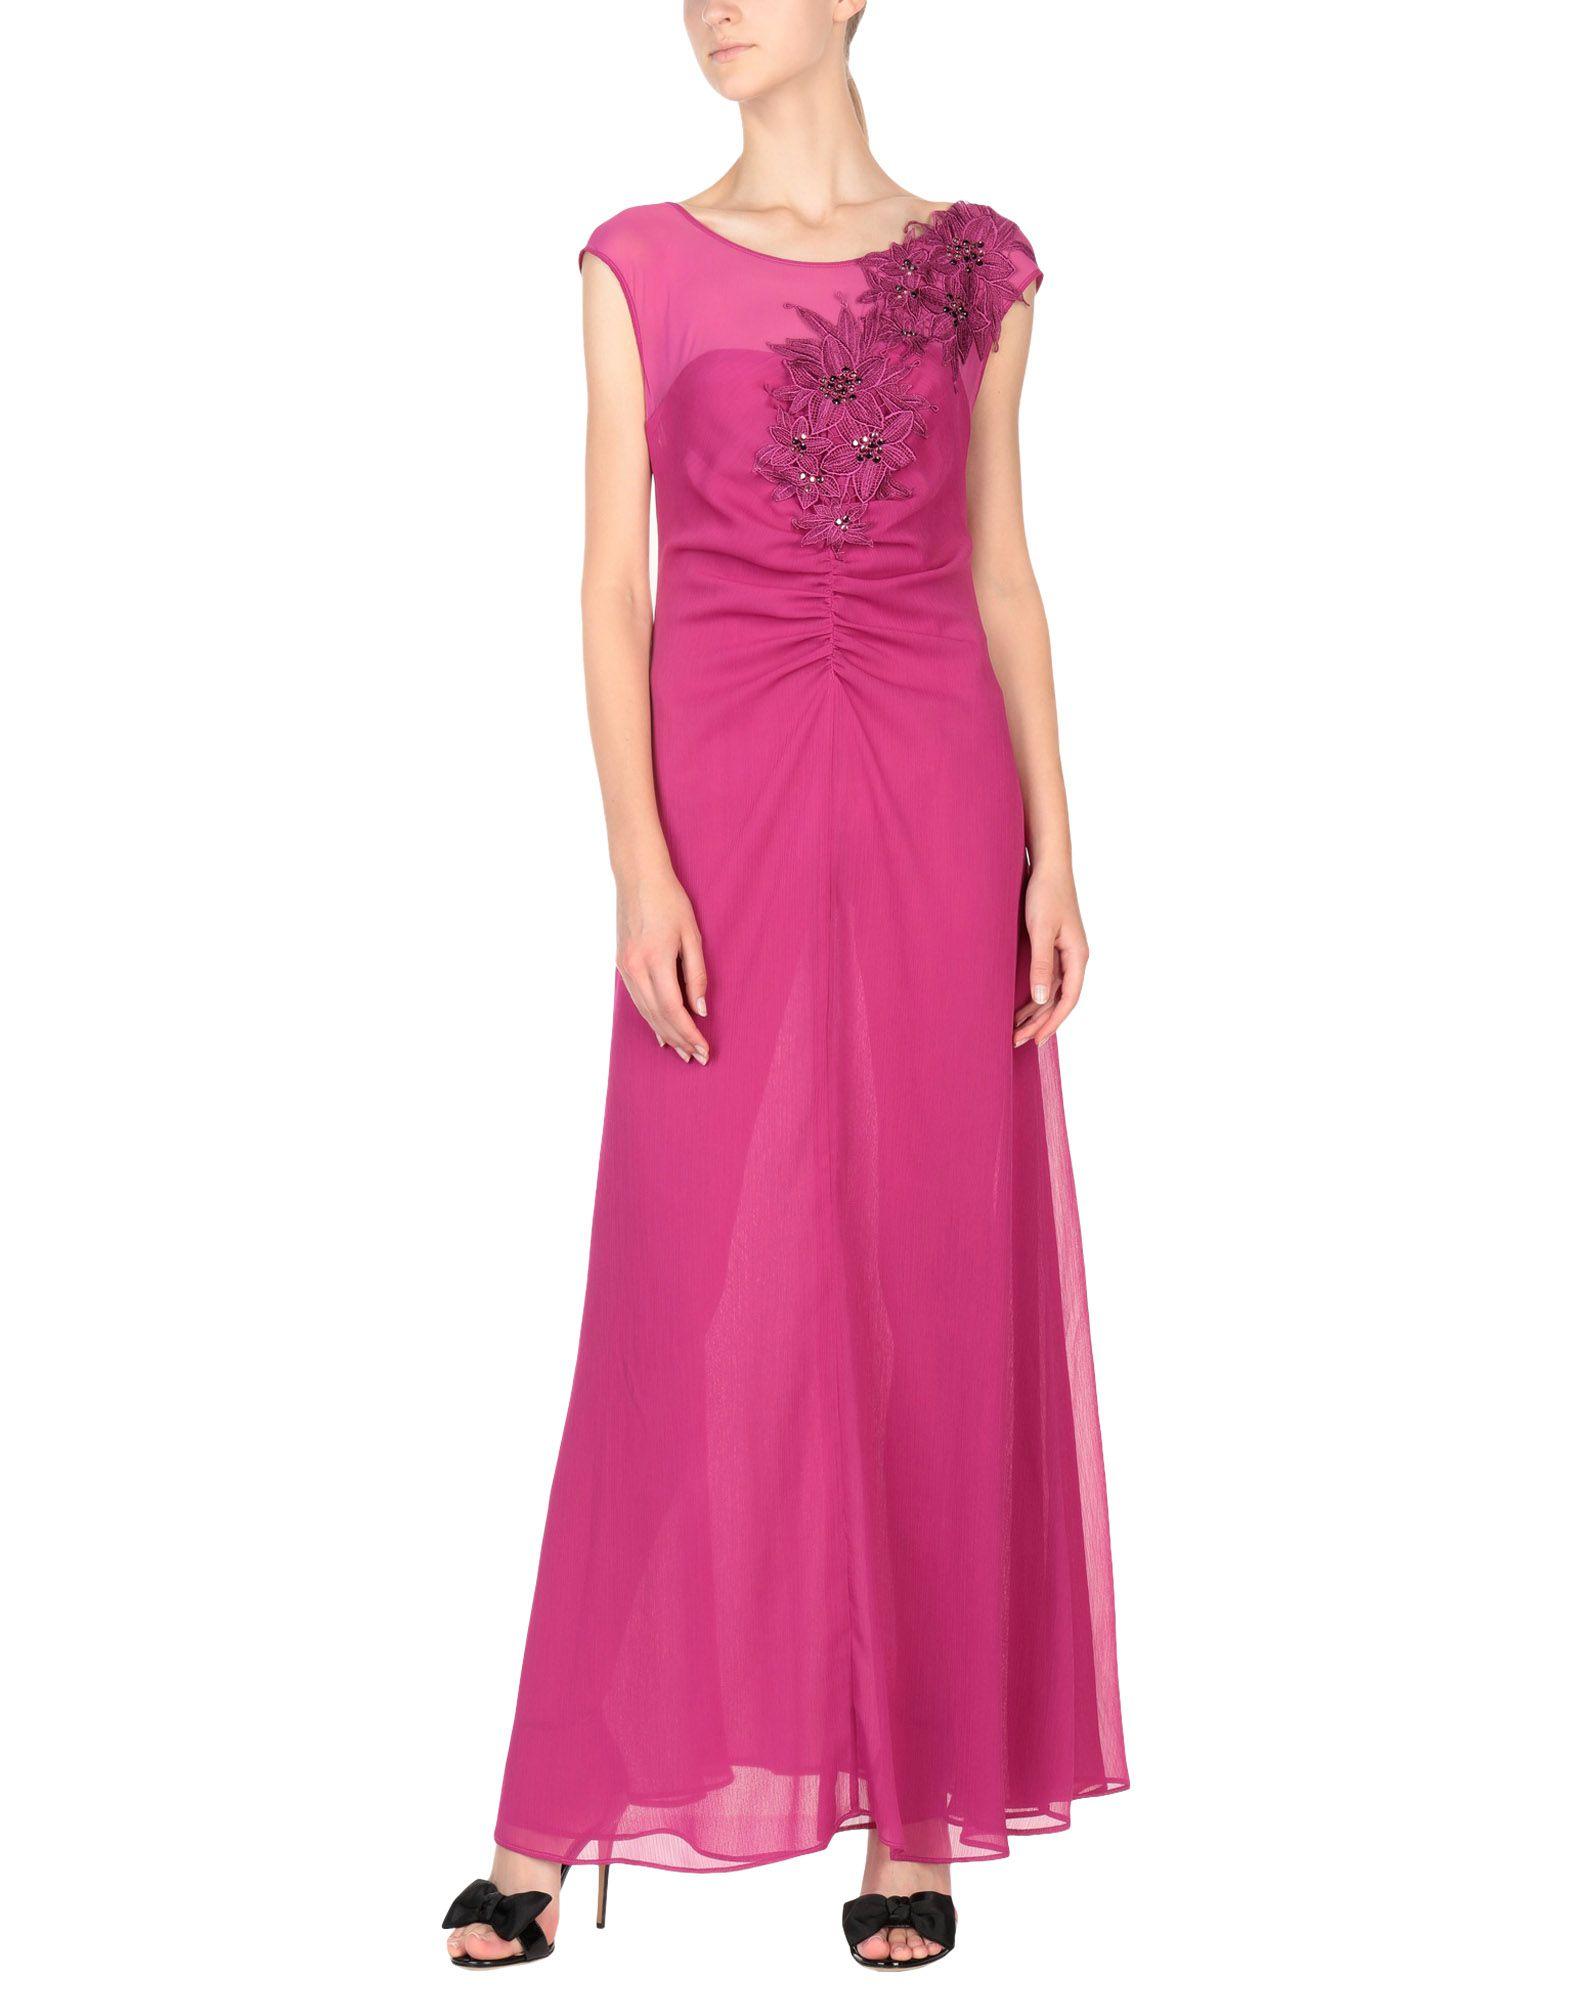 MARTA PALMIERI Длинное платье